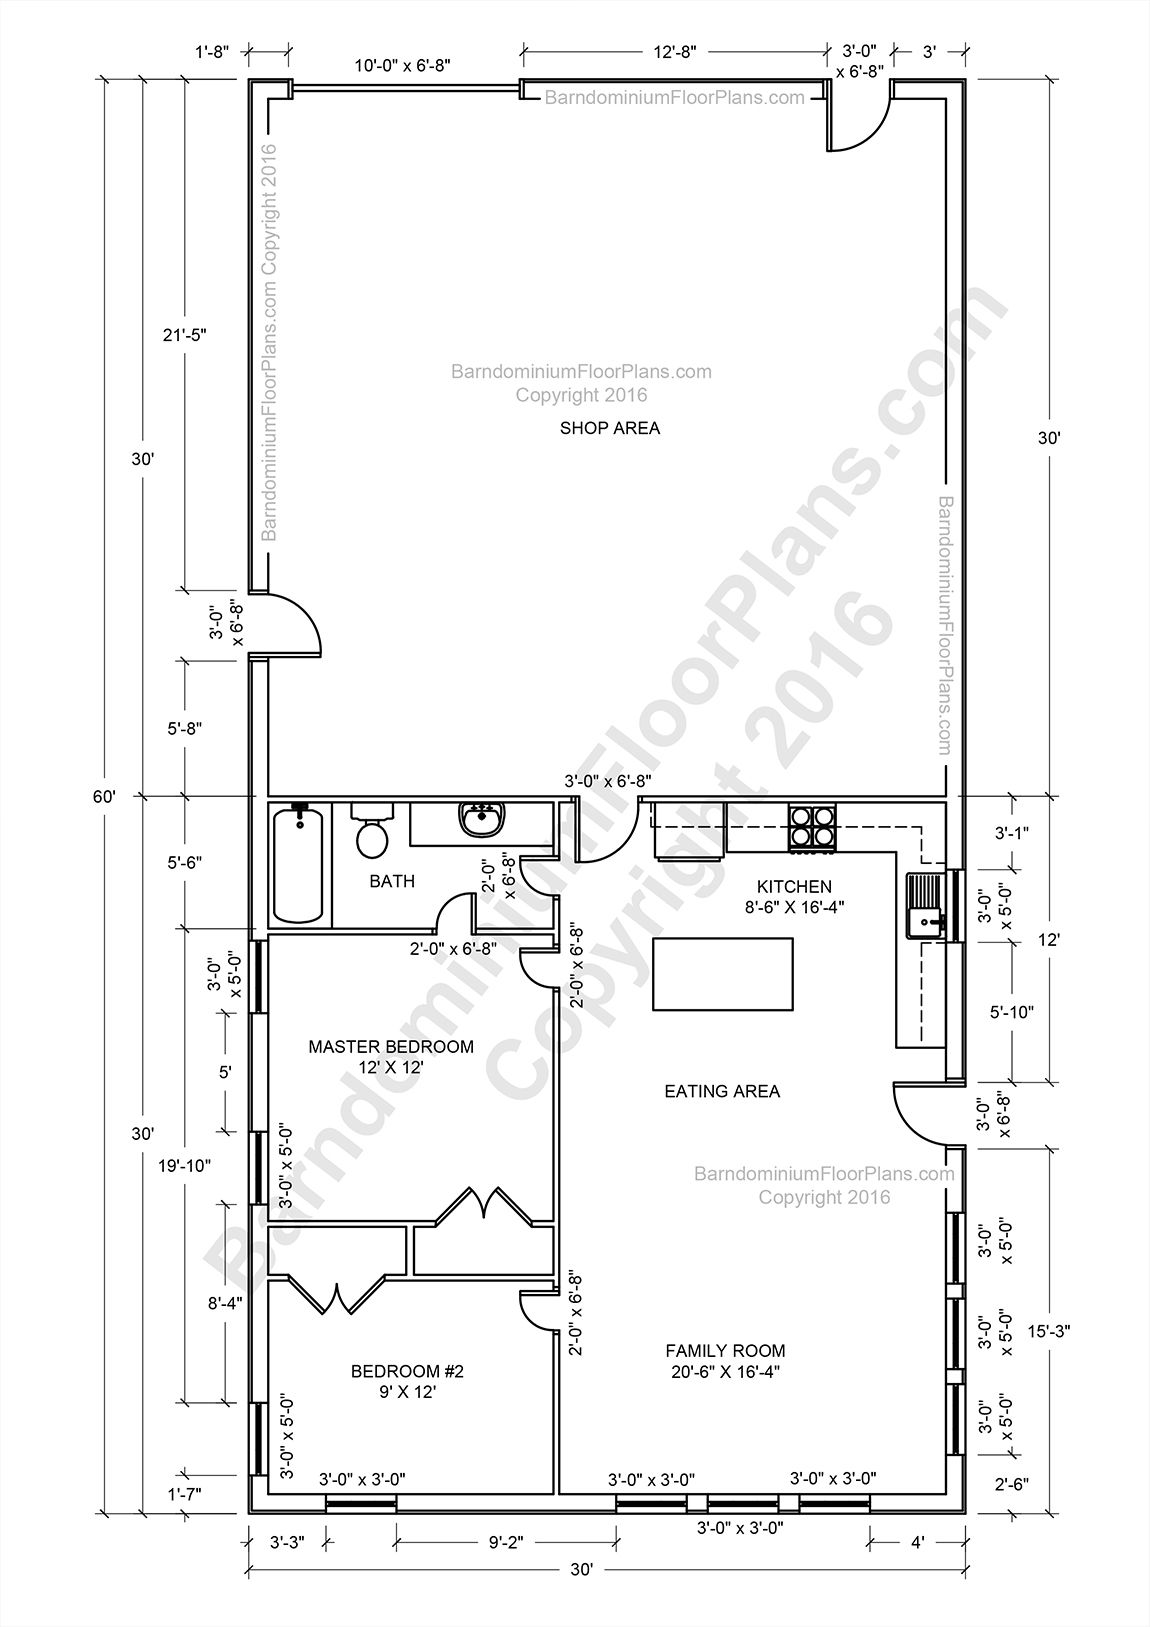 barndominium floor plans pole barn house plans and metal barn homes barndominium floor plans  [ 1150 x 1627 Pixel ]